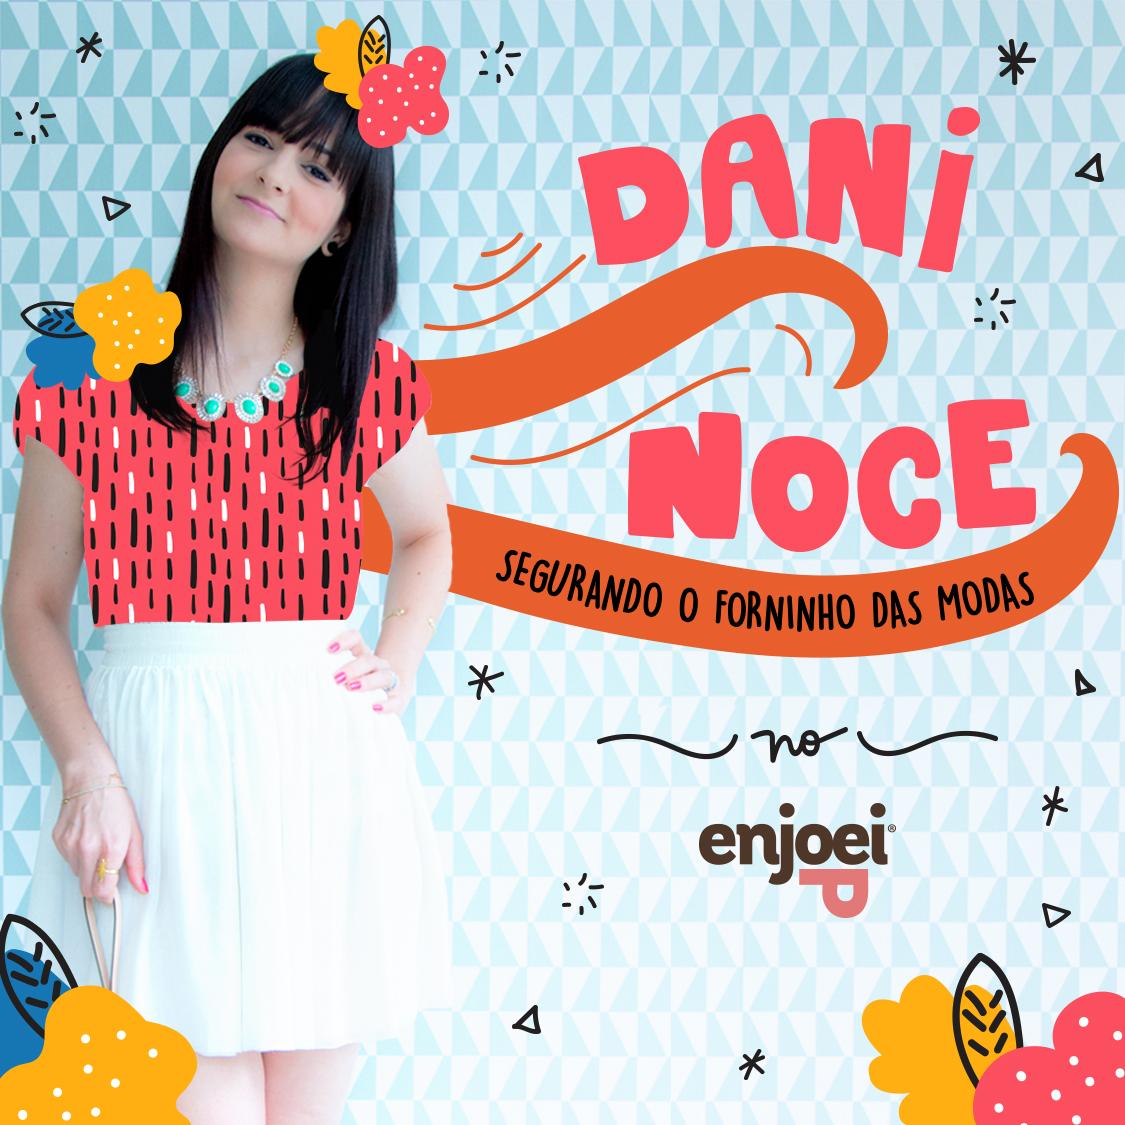 lojinha-danielle-noce-no-enjoei-1